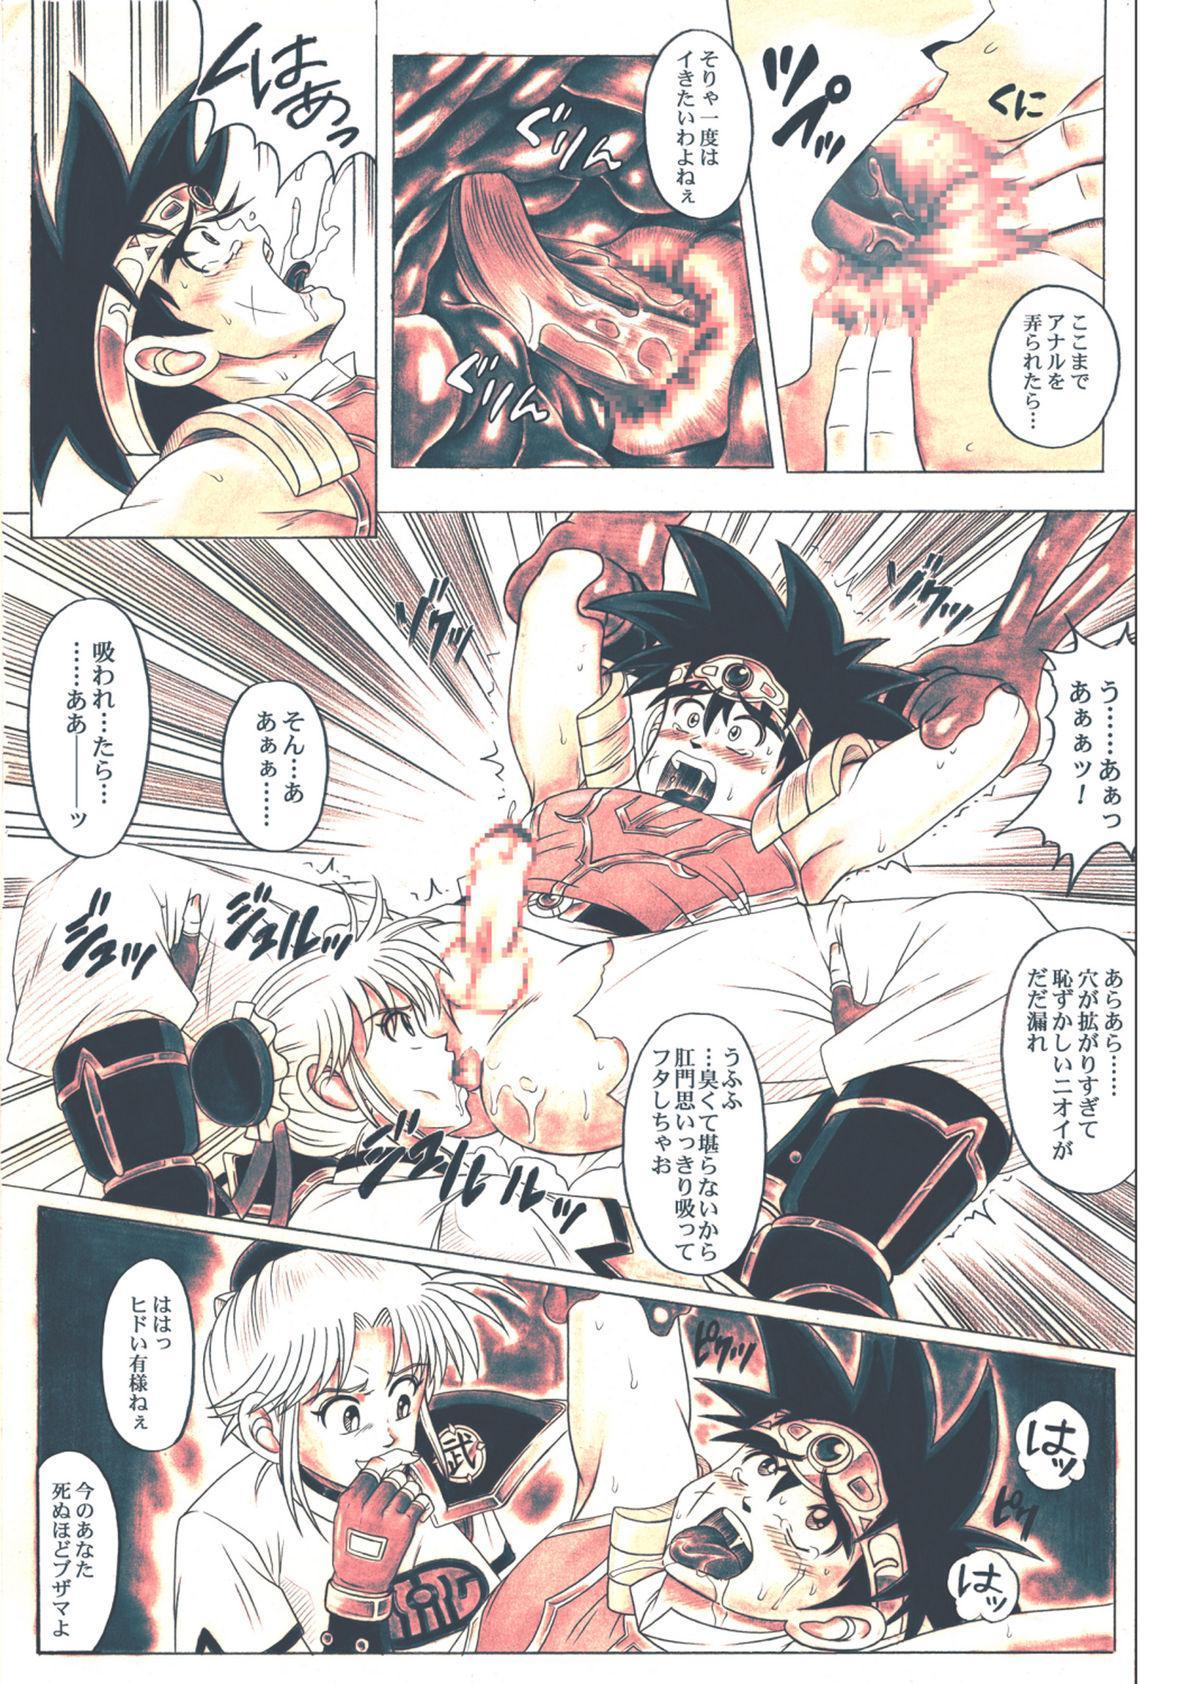 [Cyclone (Reizei, Izumi)] STAR TAC IDO ~Youkuso Haja no Doukutsu he~ Chuuhen Download edition (Dragon Warrior: Dai's Great Adventure) [Digital] 134